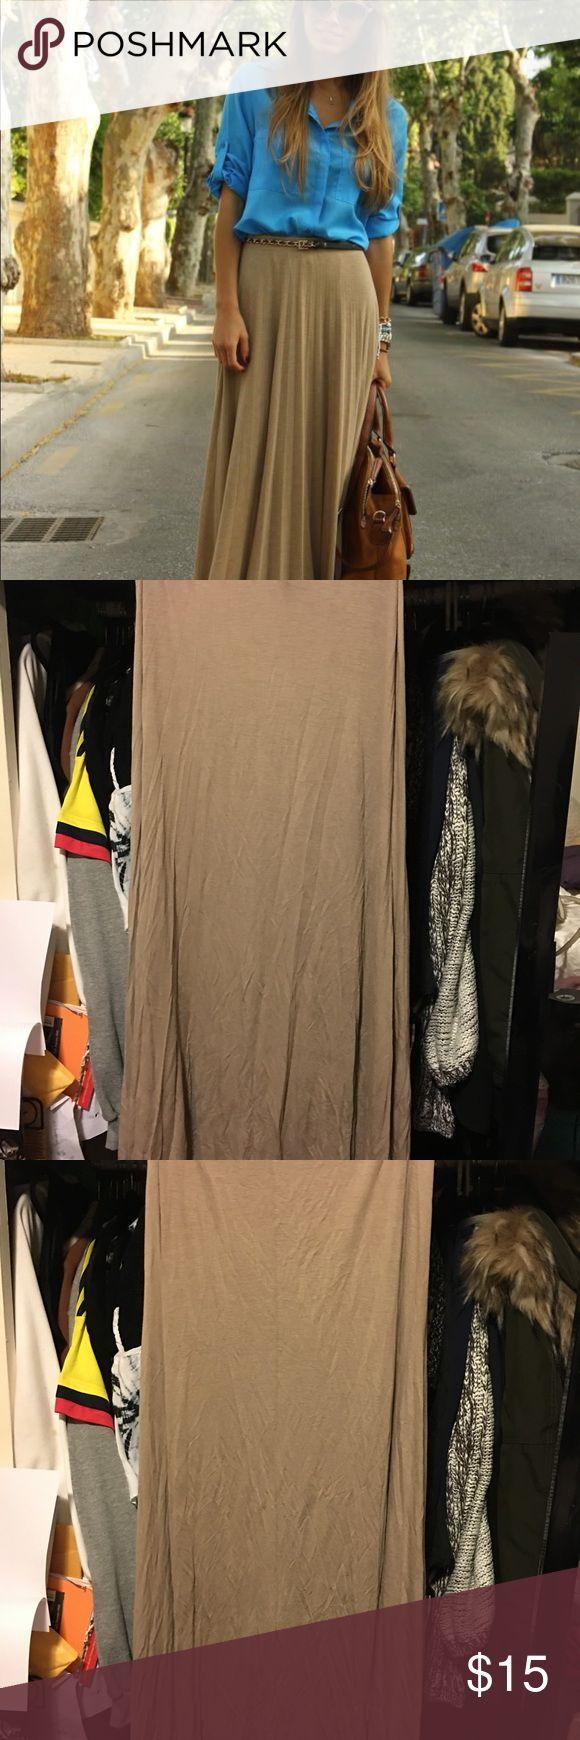 Tan Maxi Skirt Size L Tan Maxi Skirt Size L, perfect for summer & fall! Super cute!! Skirts Maxi